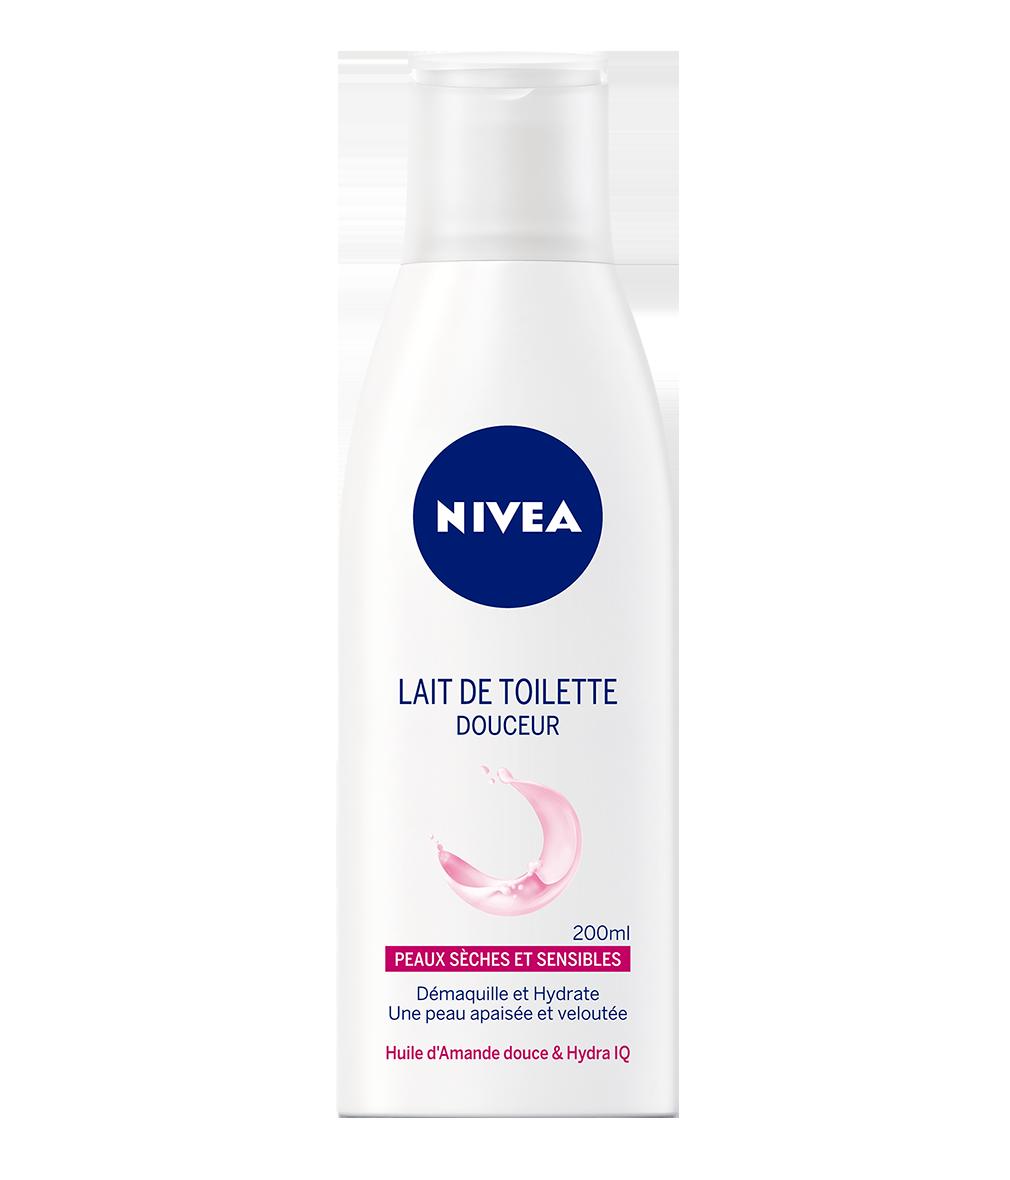 81103 NIVEA Lait de Toilette Douceur 200 ML حليب ناعم، المخصب بزيت اللوز